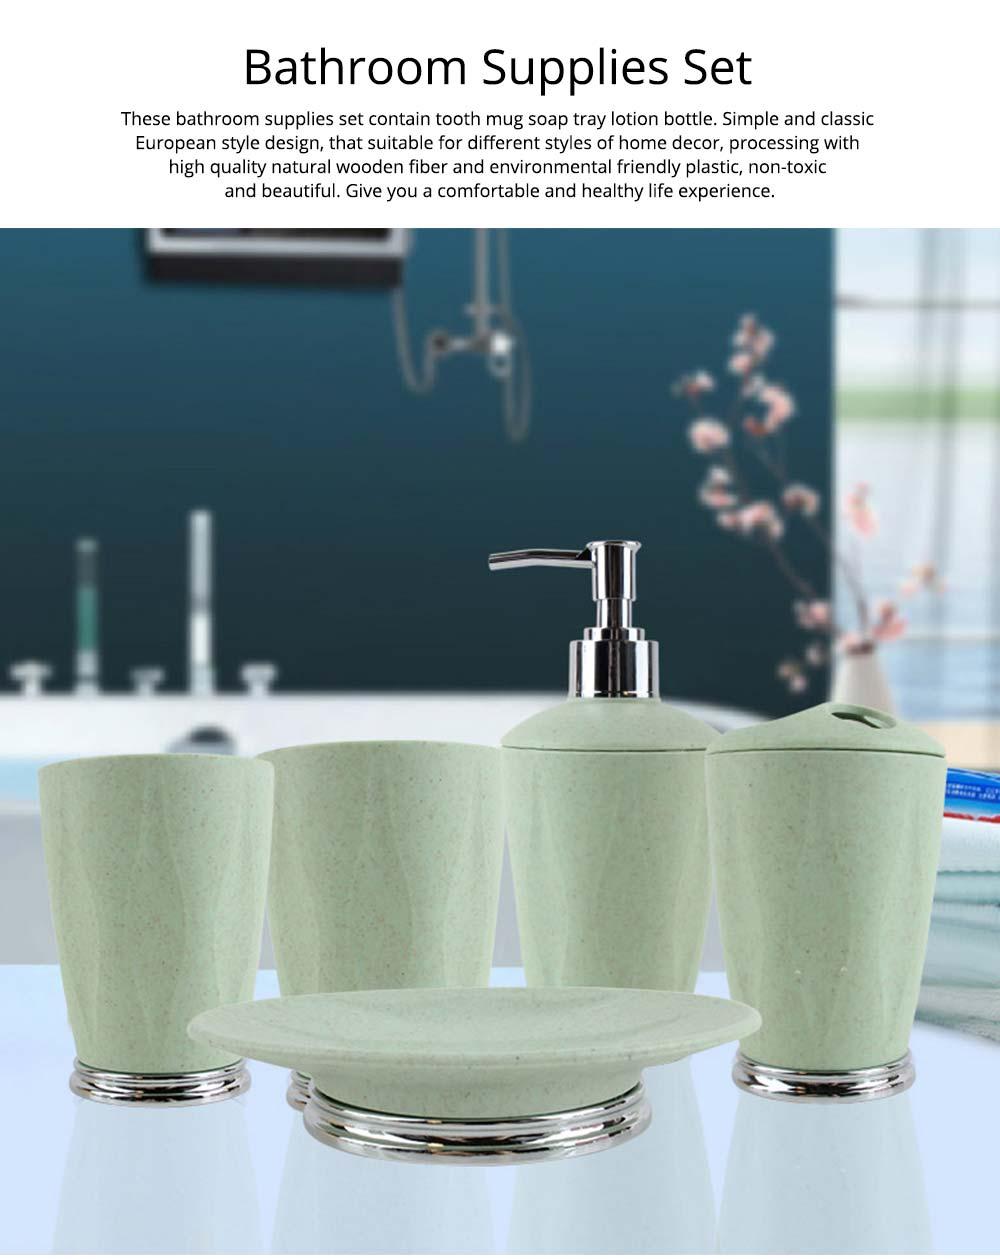 4 PCS Simple Fiber Wooden Bathroom Wash Supplies Set For Wedding Home Hotel 0